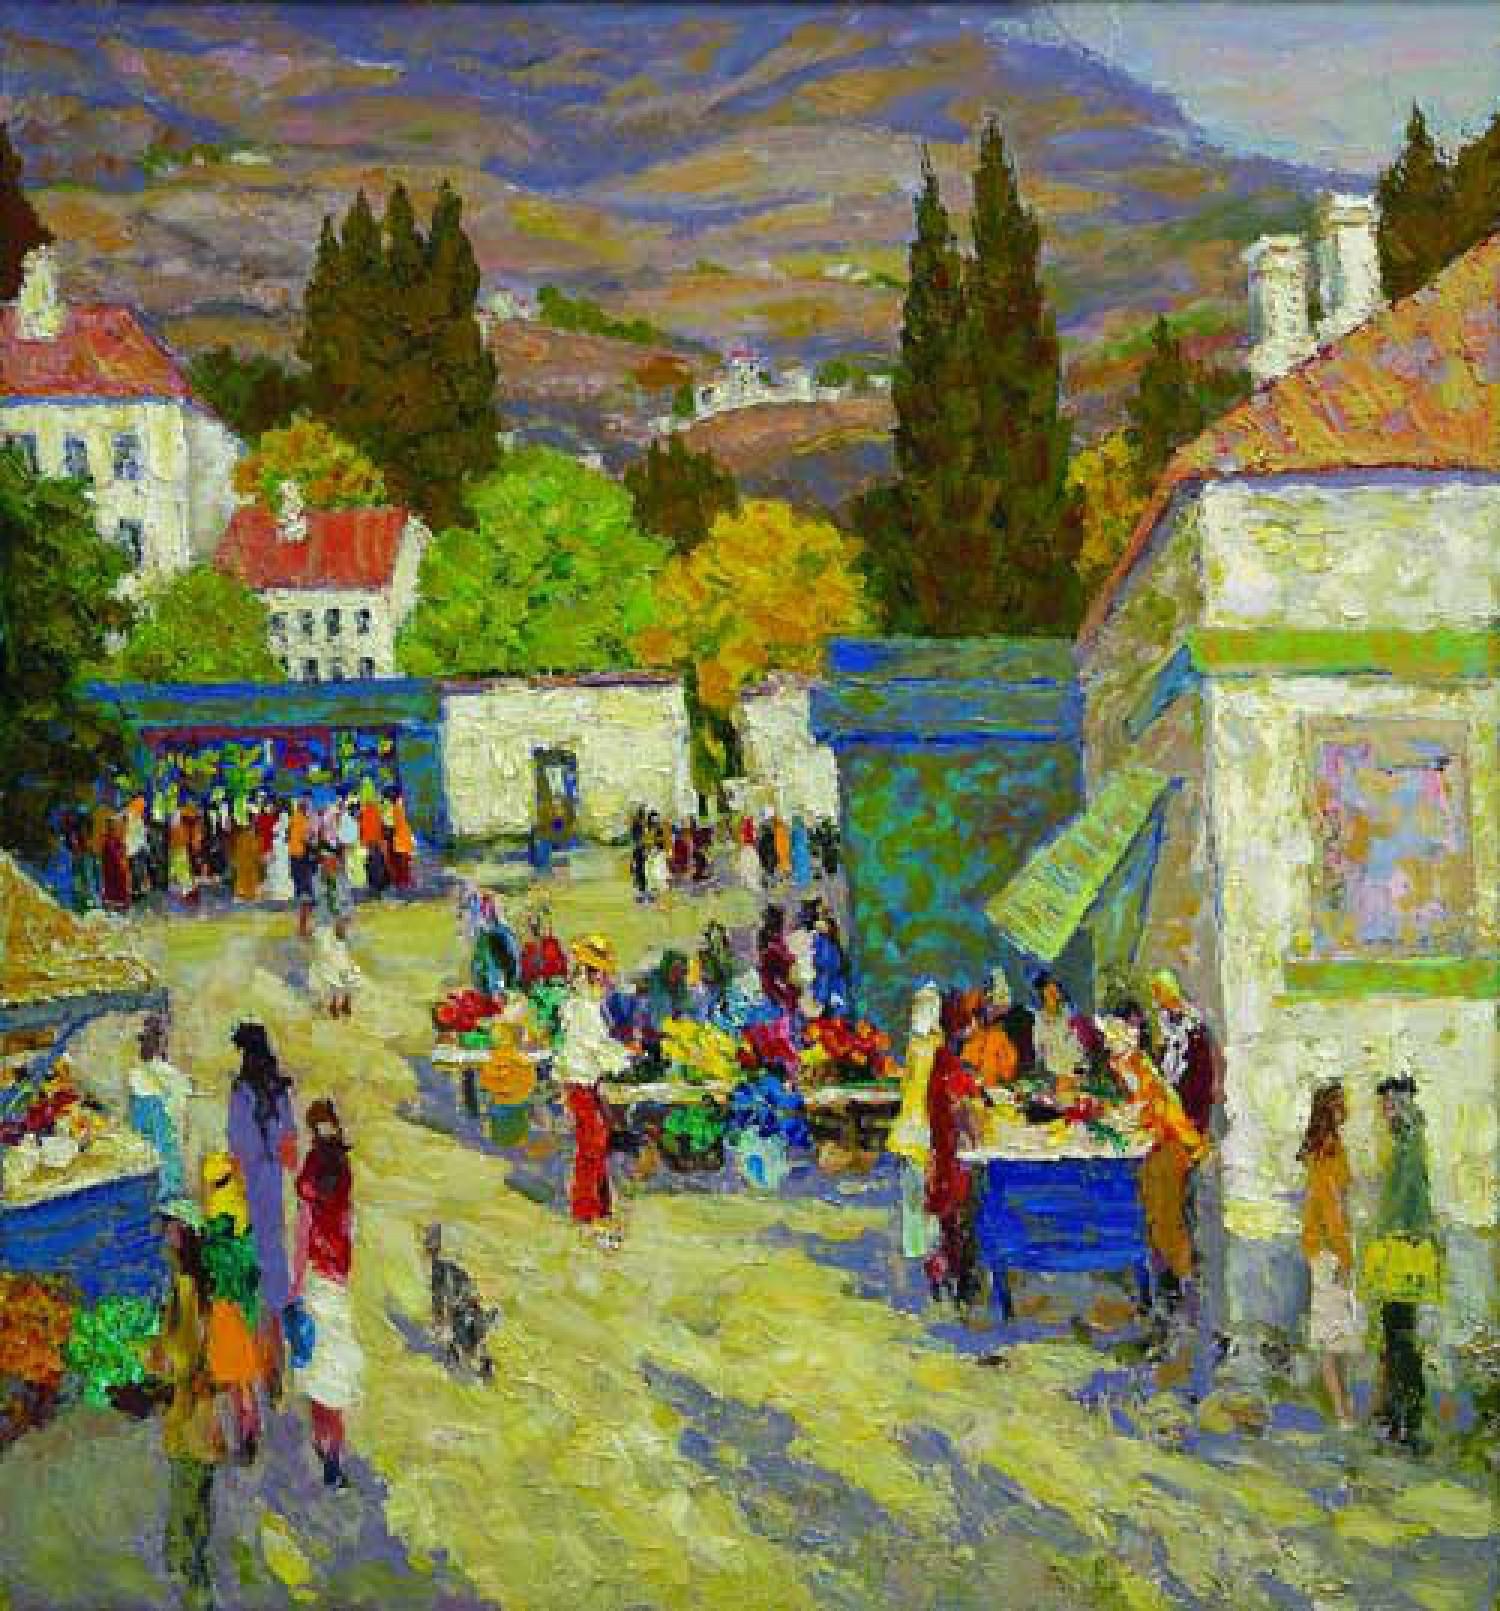 Ю.Д.Жарков. Базар в Гурзуфе. 1997-2008. 120х110. Х.м. Цена 150 000 руб.